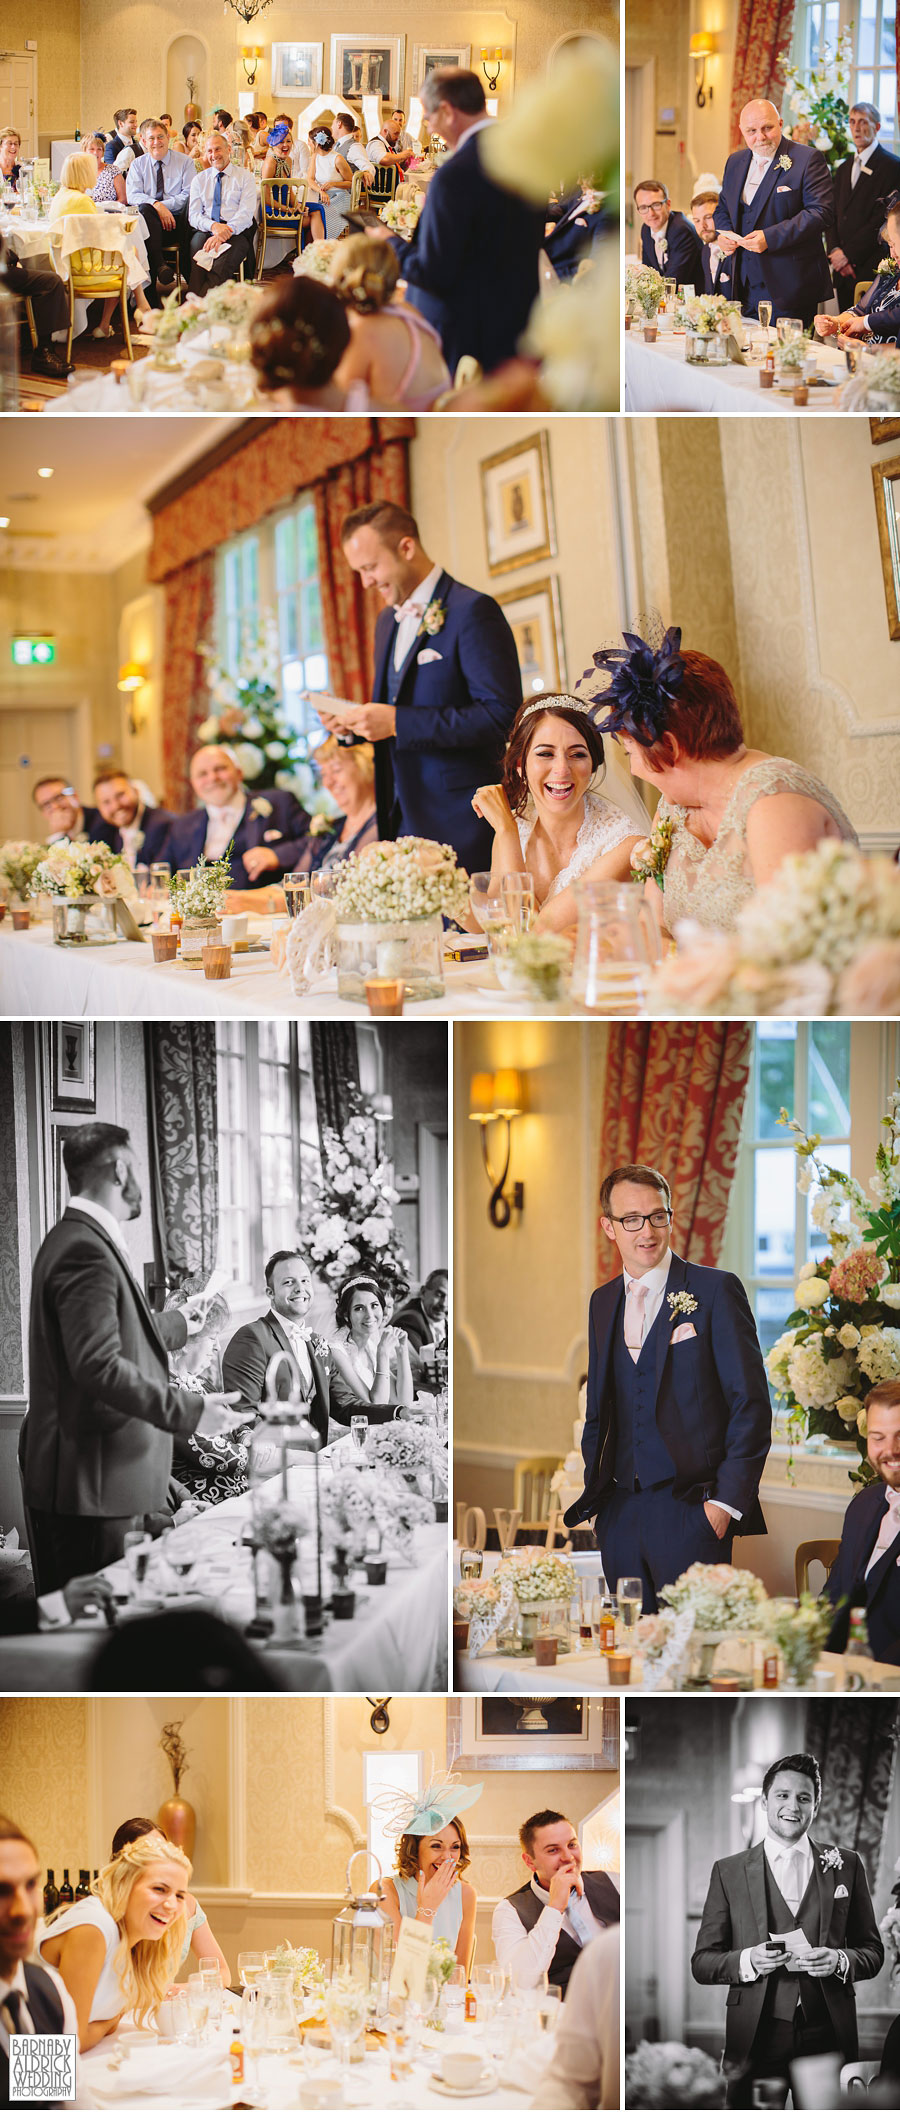 Wood Hall Linton Wetherby Wedding Photography 058